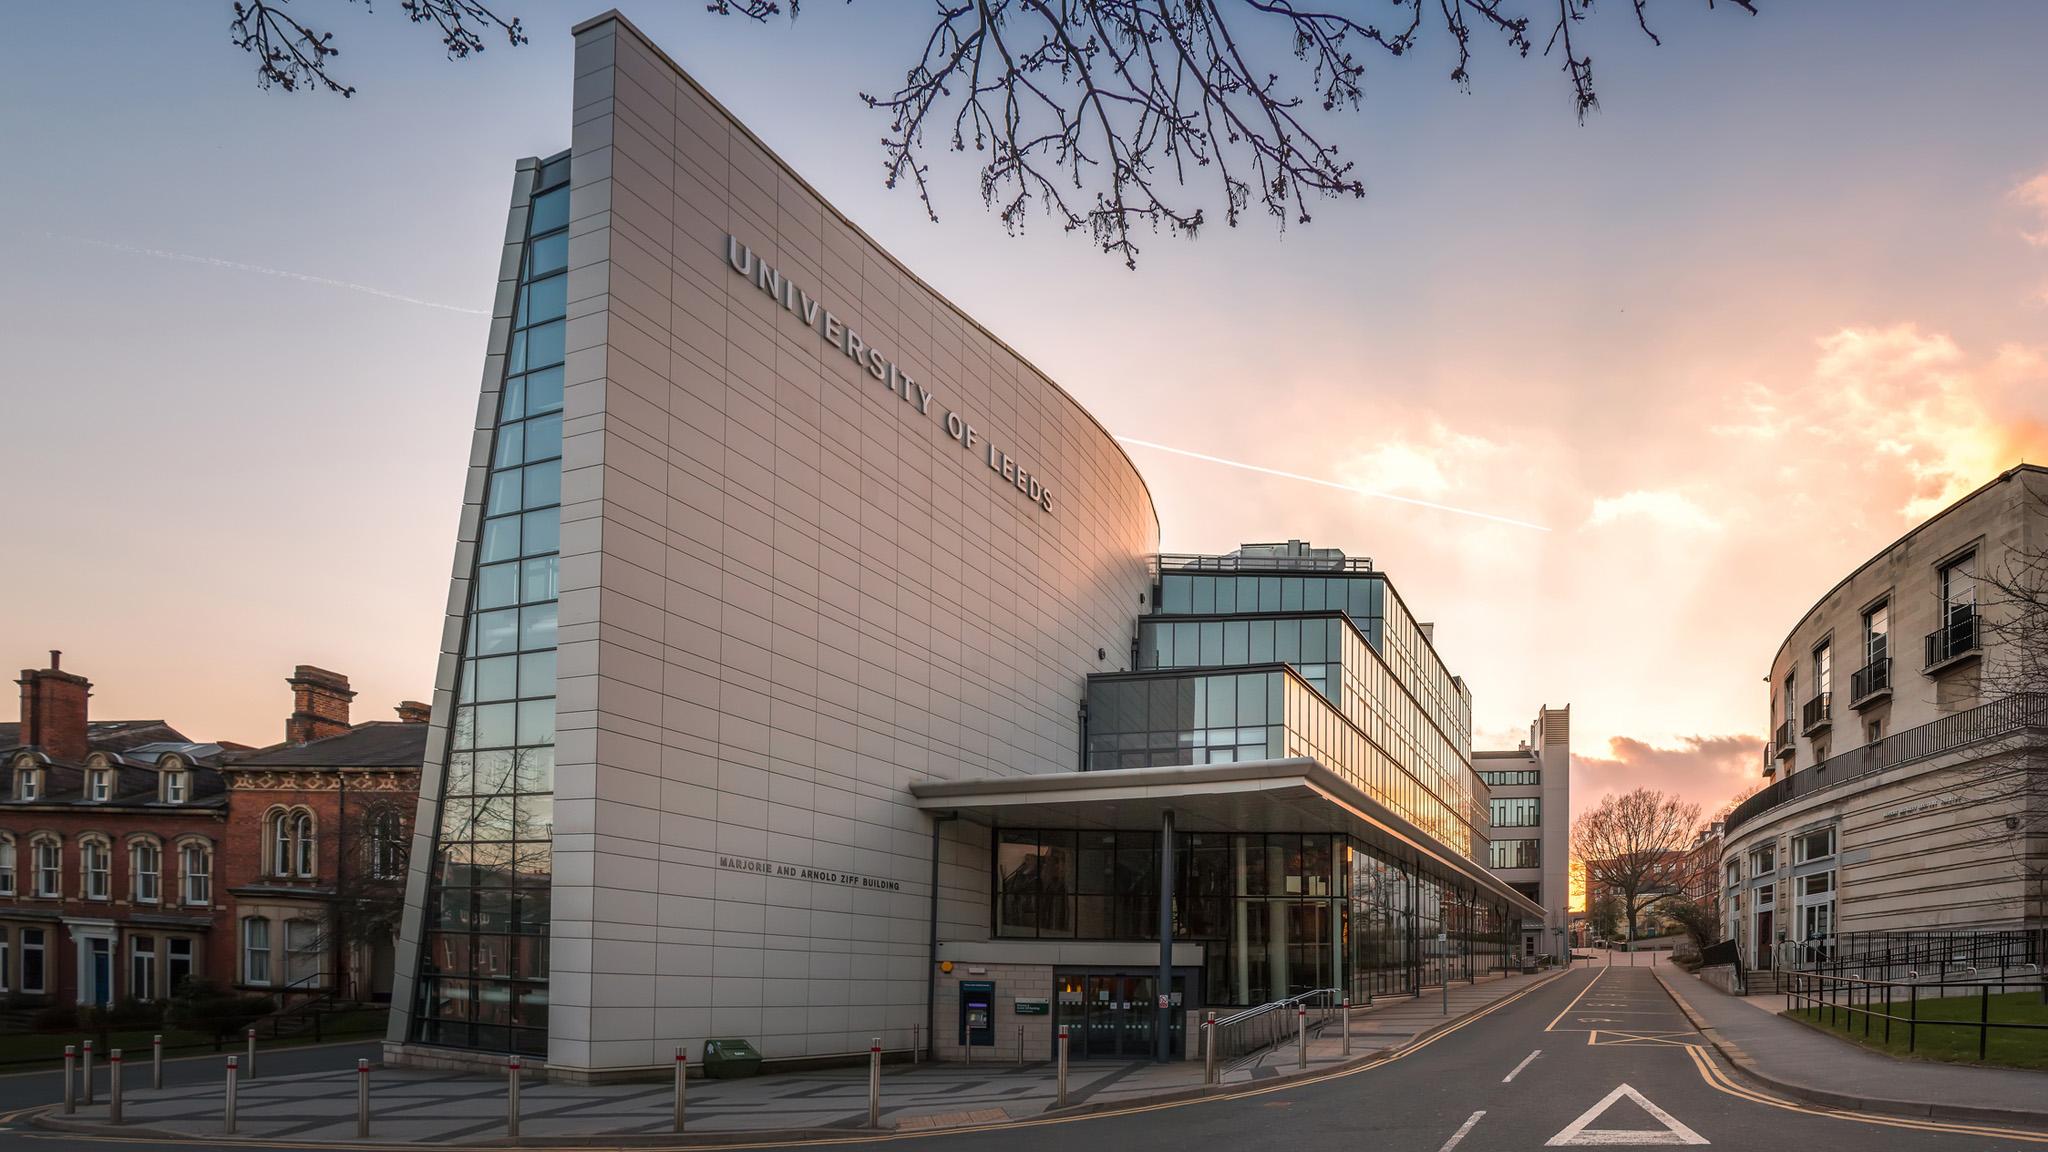 Leeds university dissertation help